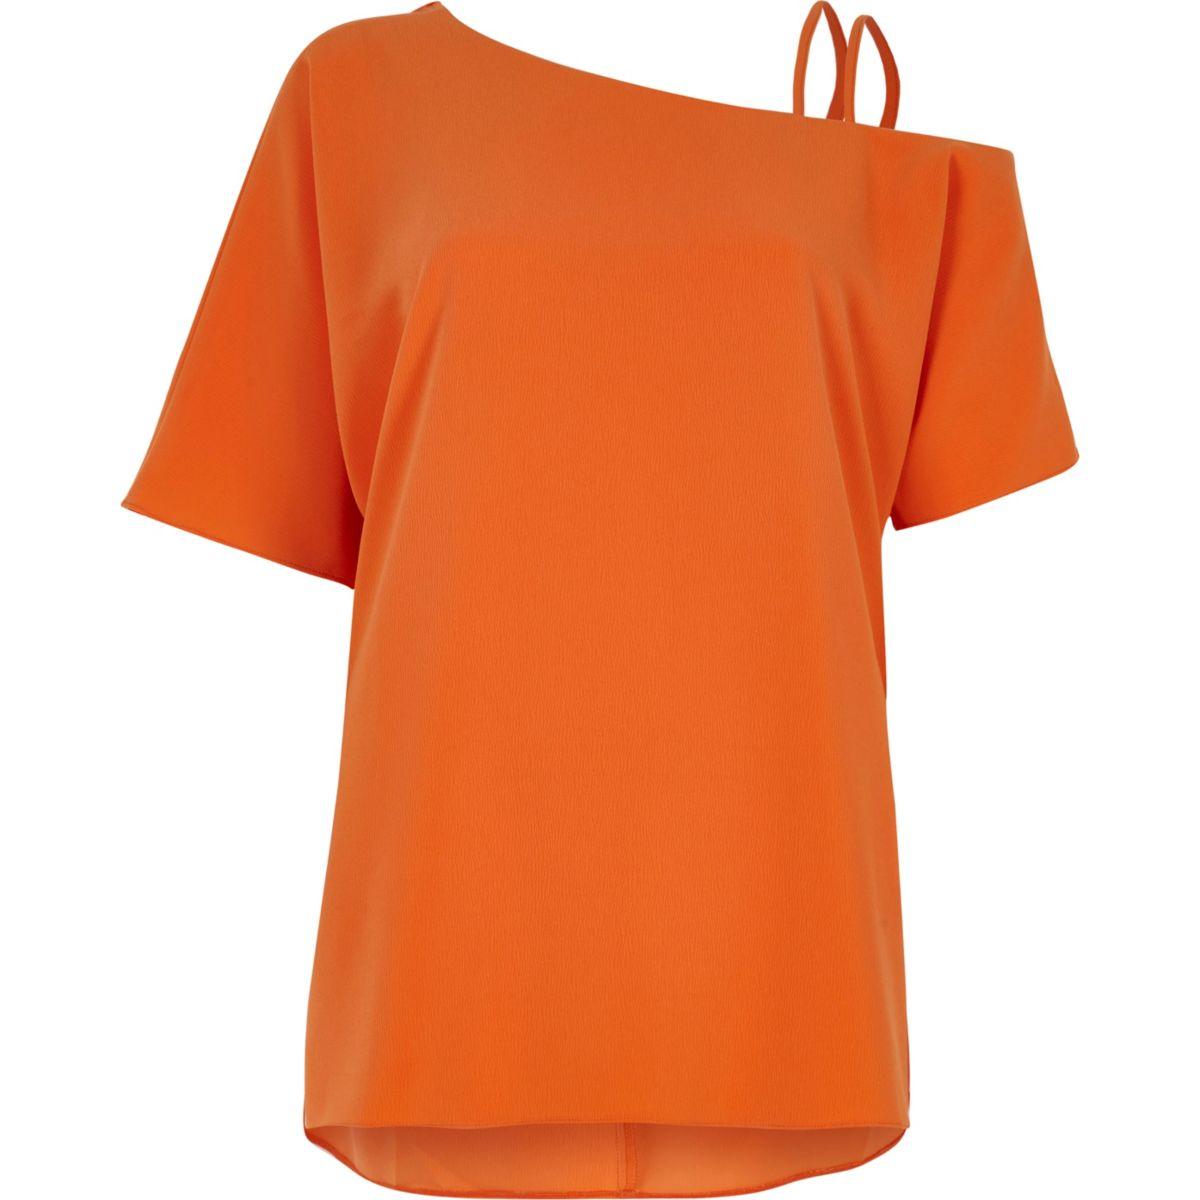 Orange cold shoulder double cami strap top